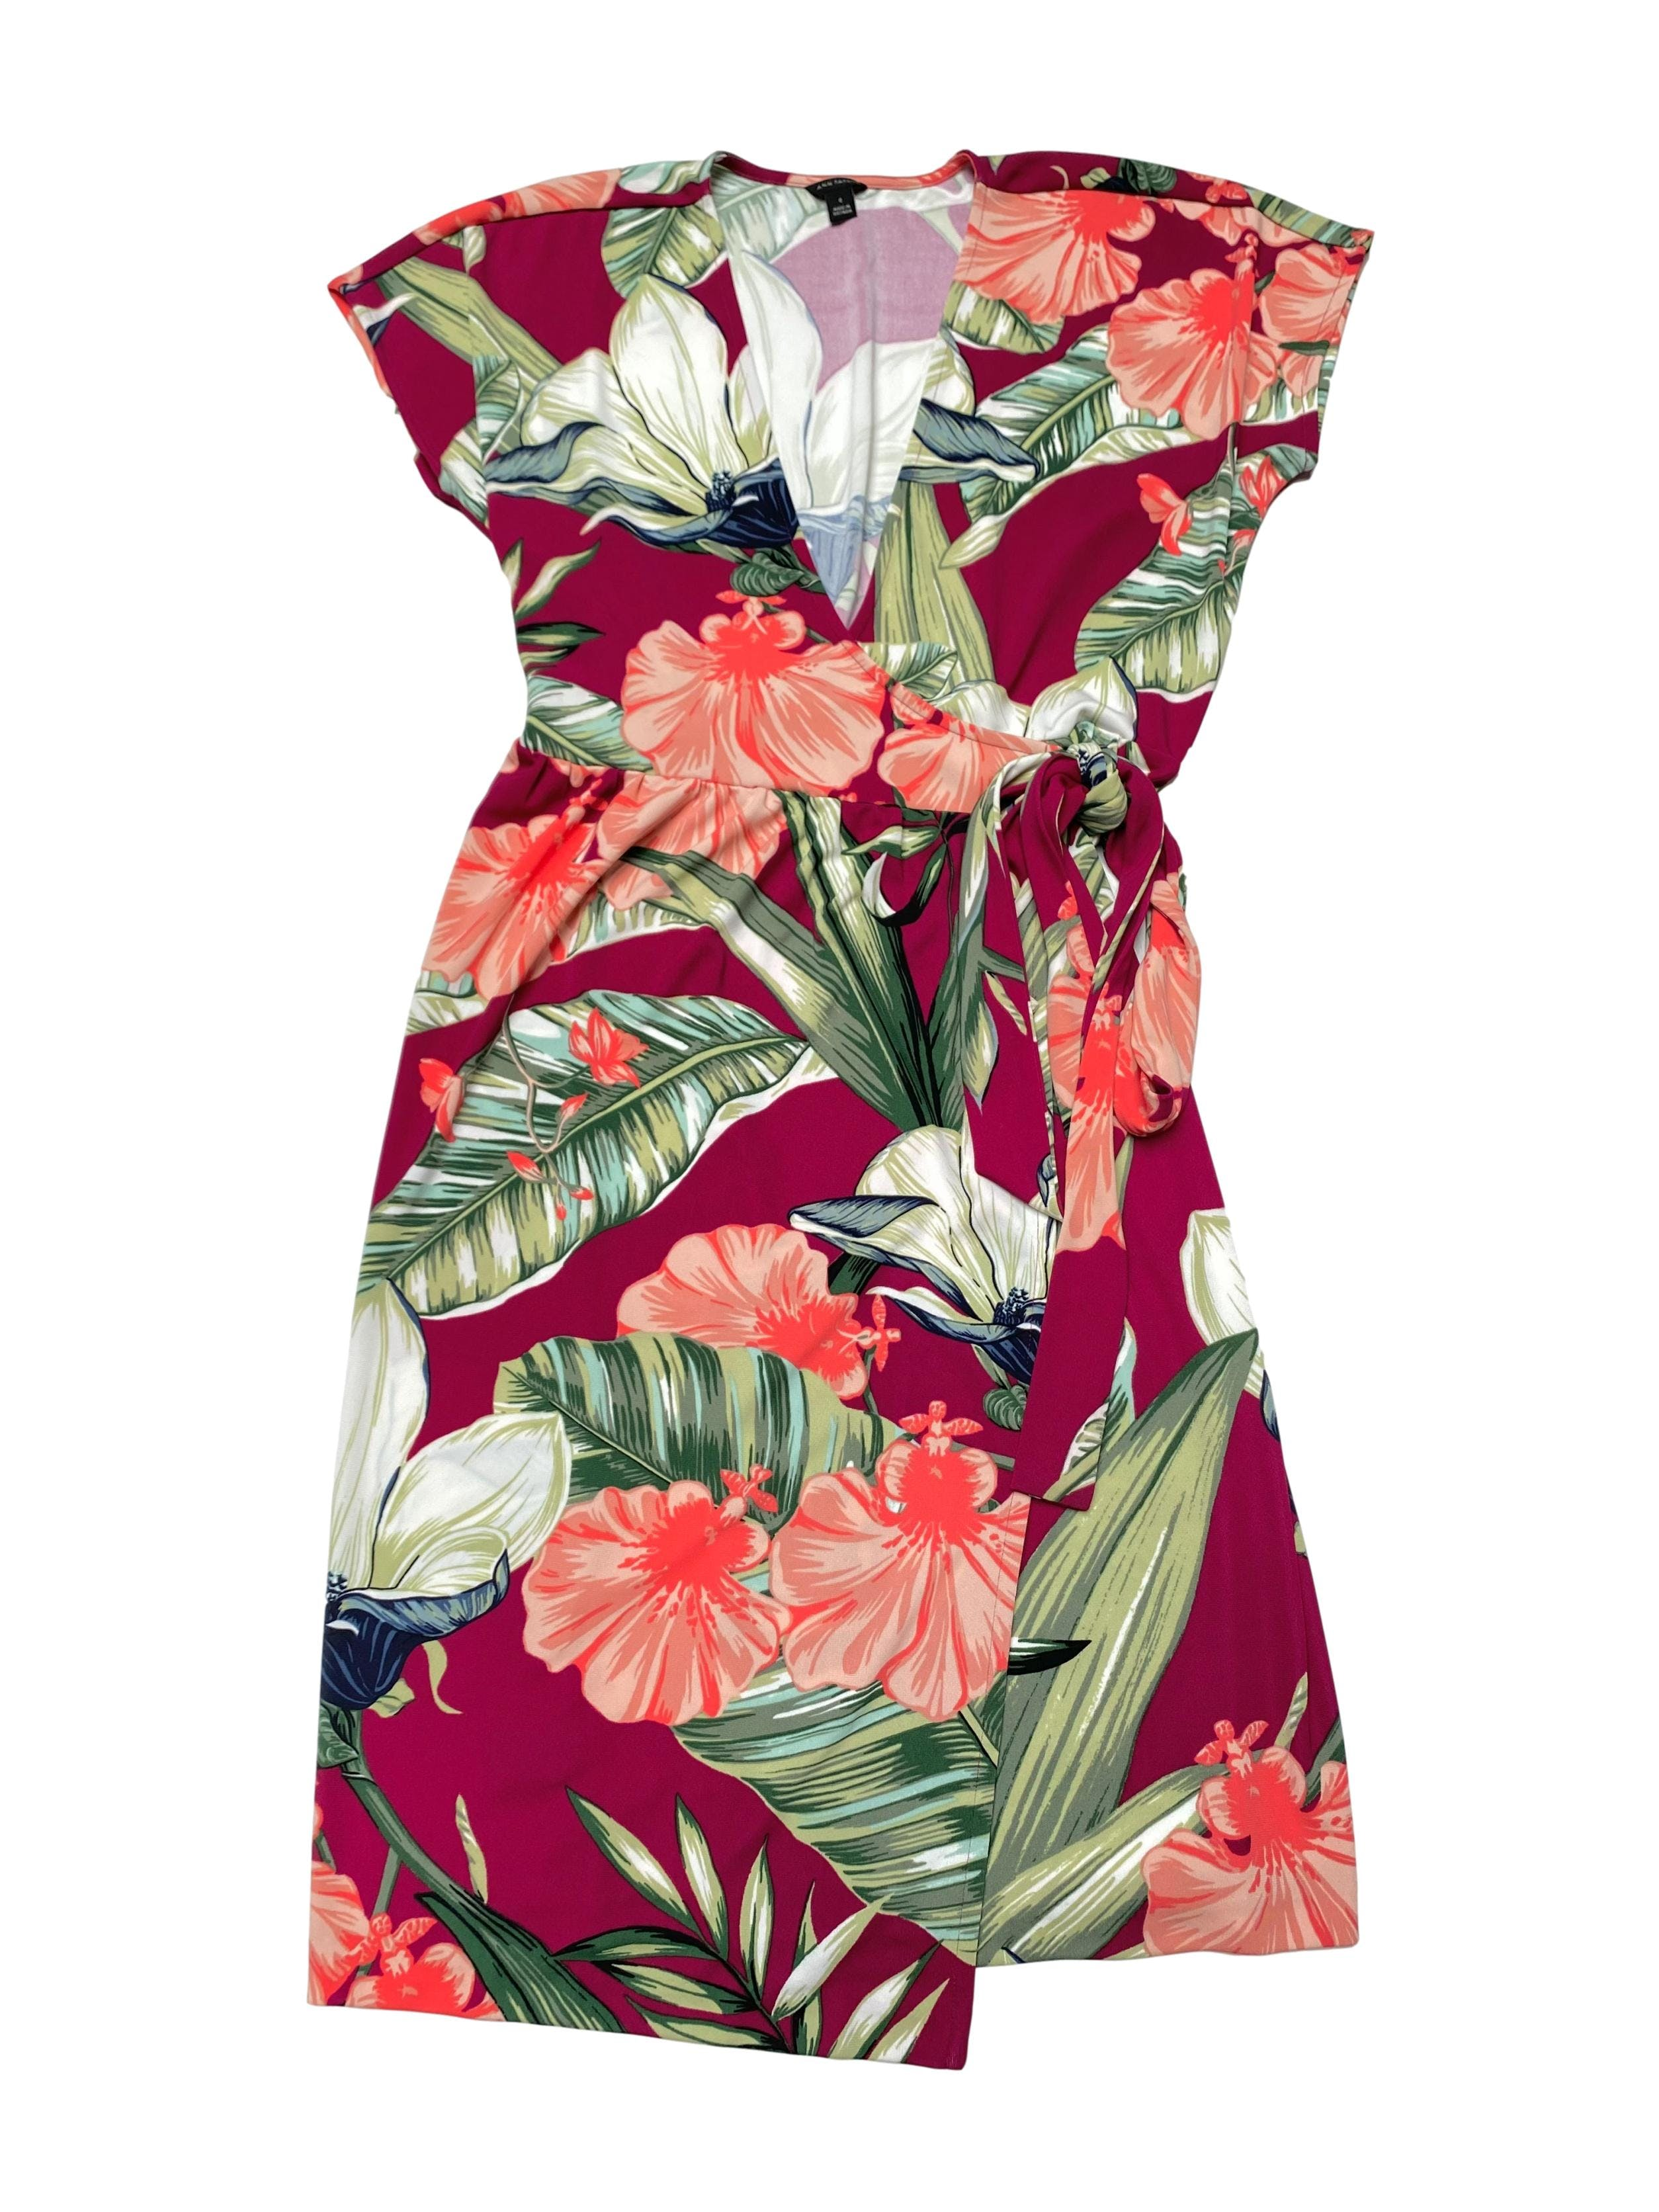 Vestido Ann Taylor envolvente guinda con estampado floreado. Largo 95cm. Hermoso!